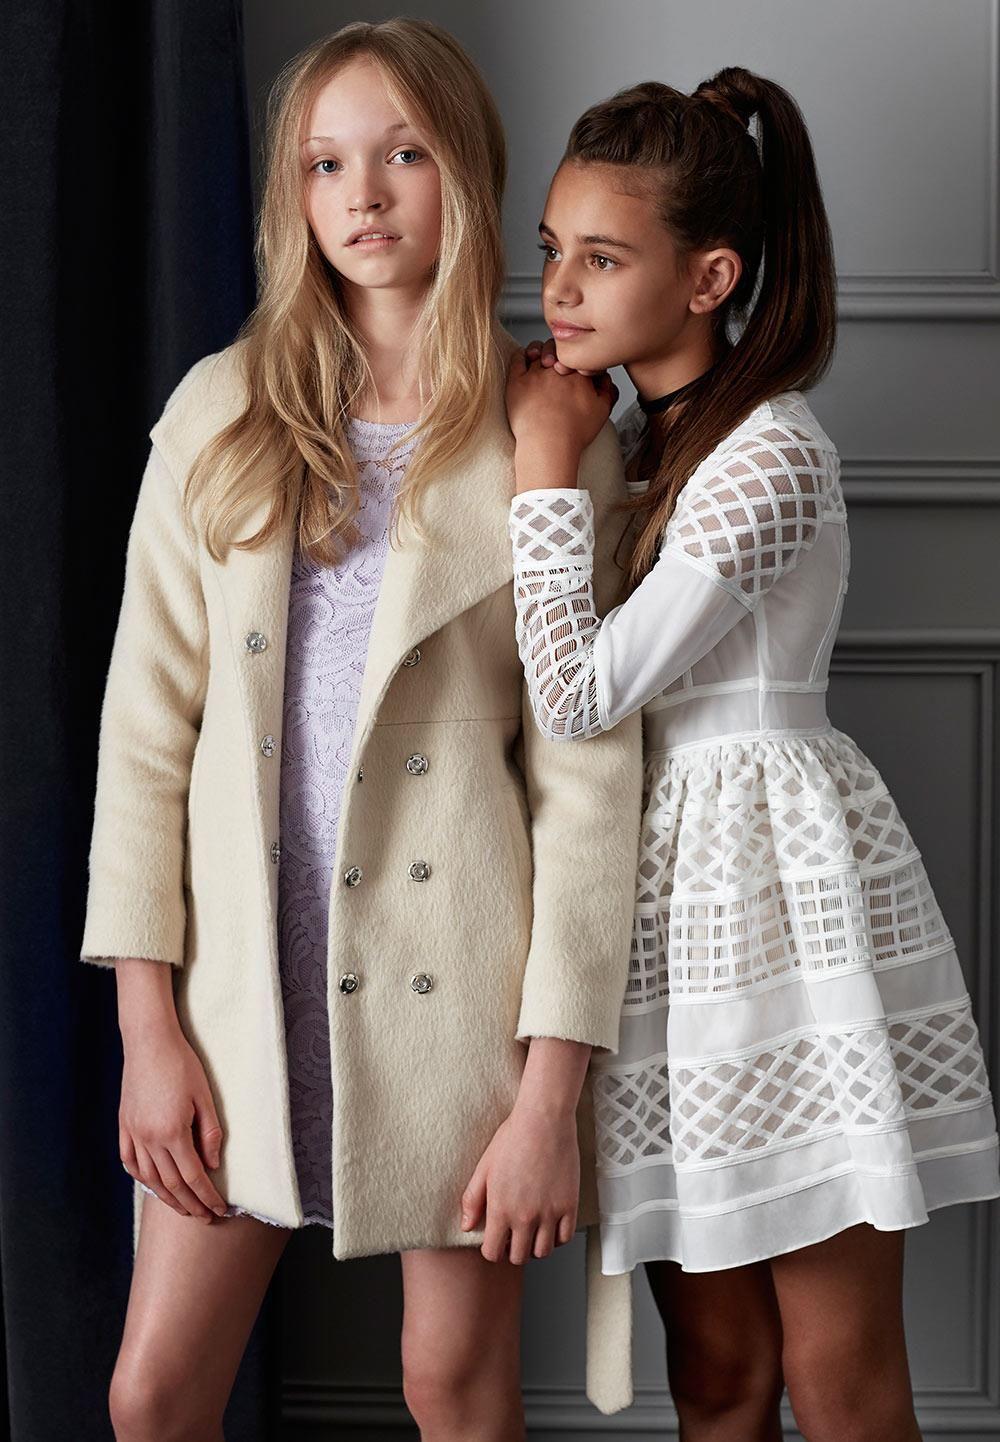 e01a1bd80bf27 Tween Girl's | Girl's Clothing | Casual and Partywear | Bardot Junior  Fashion